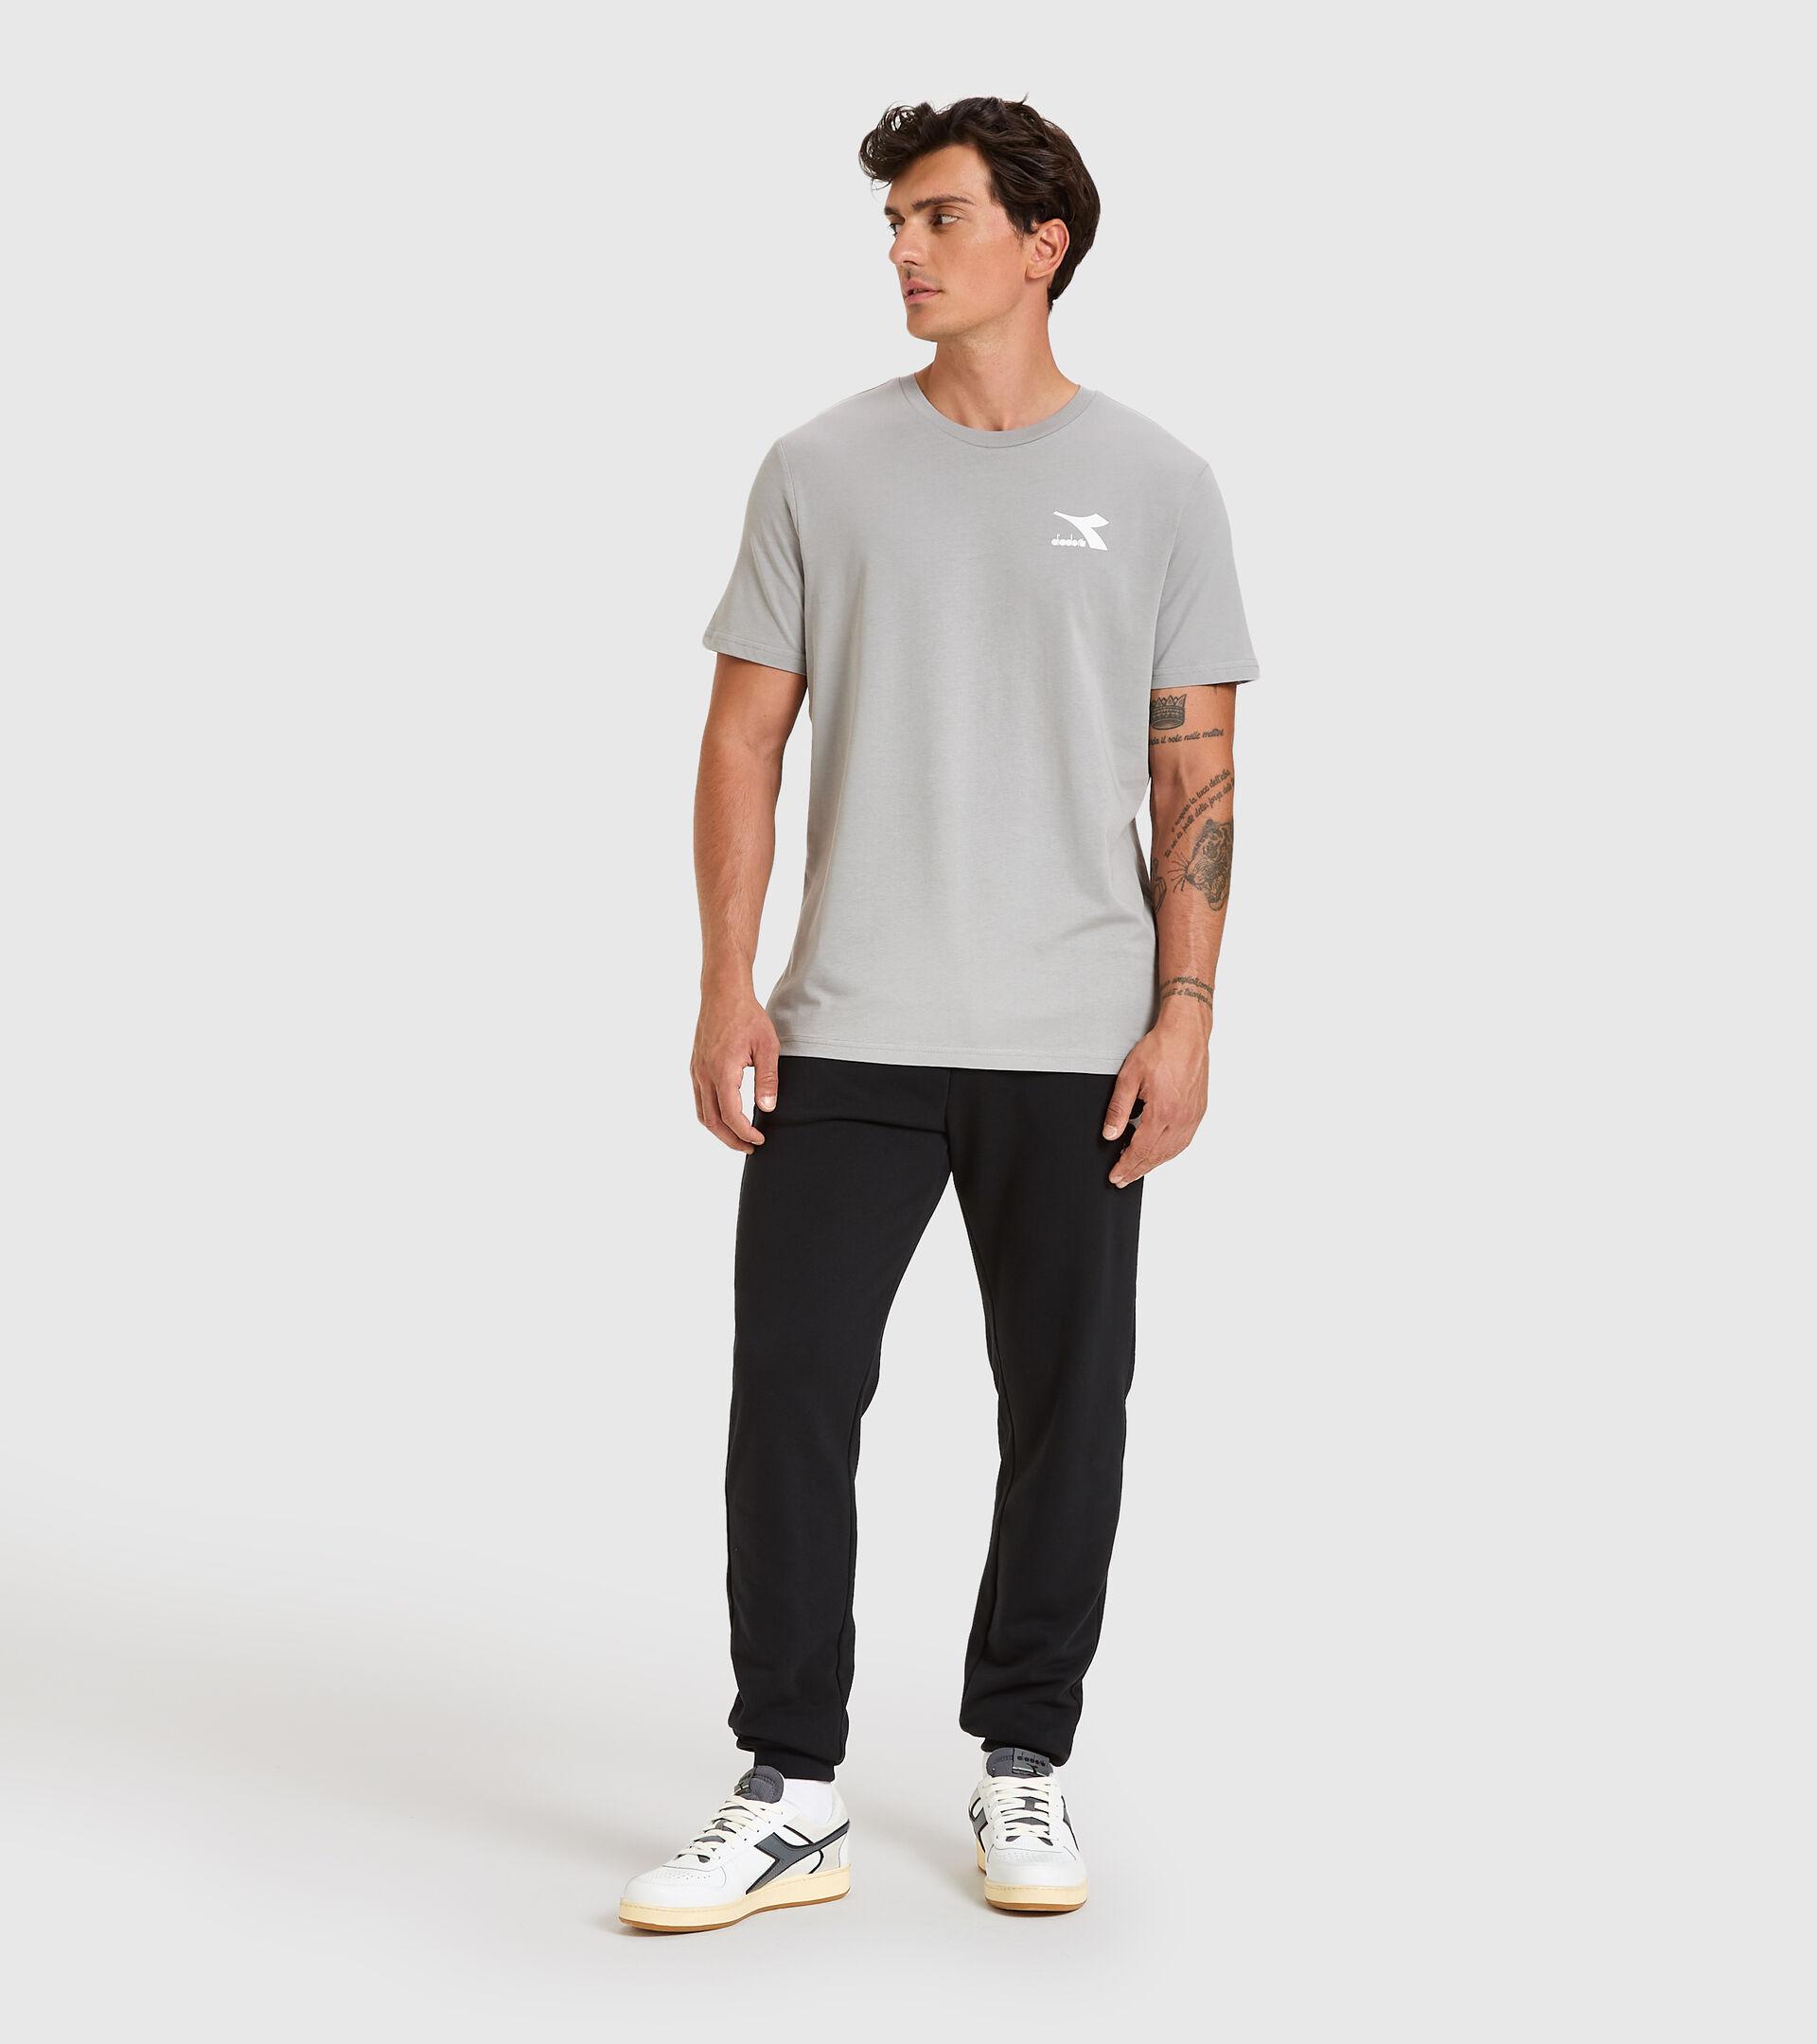 T-shirt - Men T-SHIRT SS CHROMIA GRAY MOUSE - Diadora